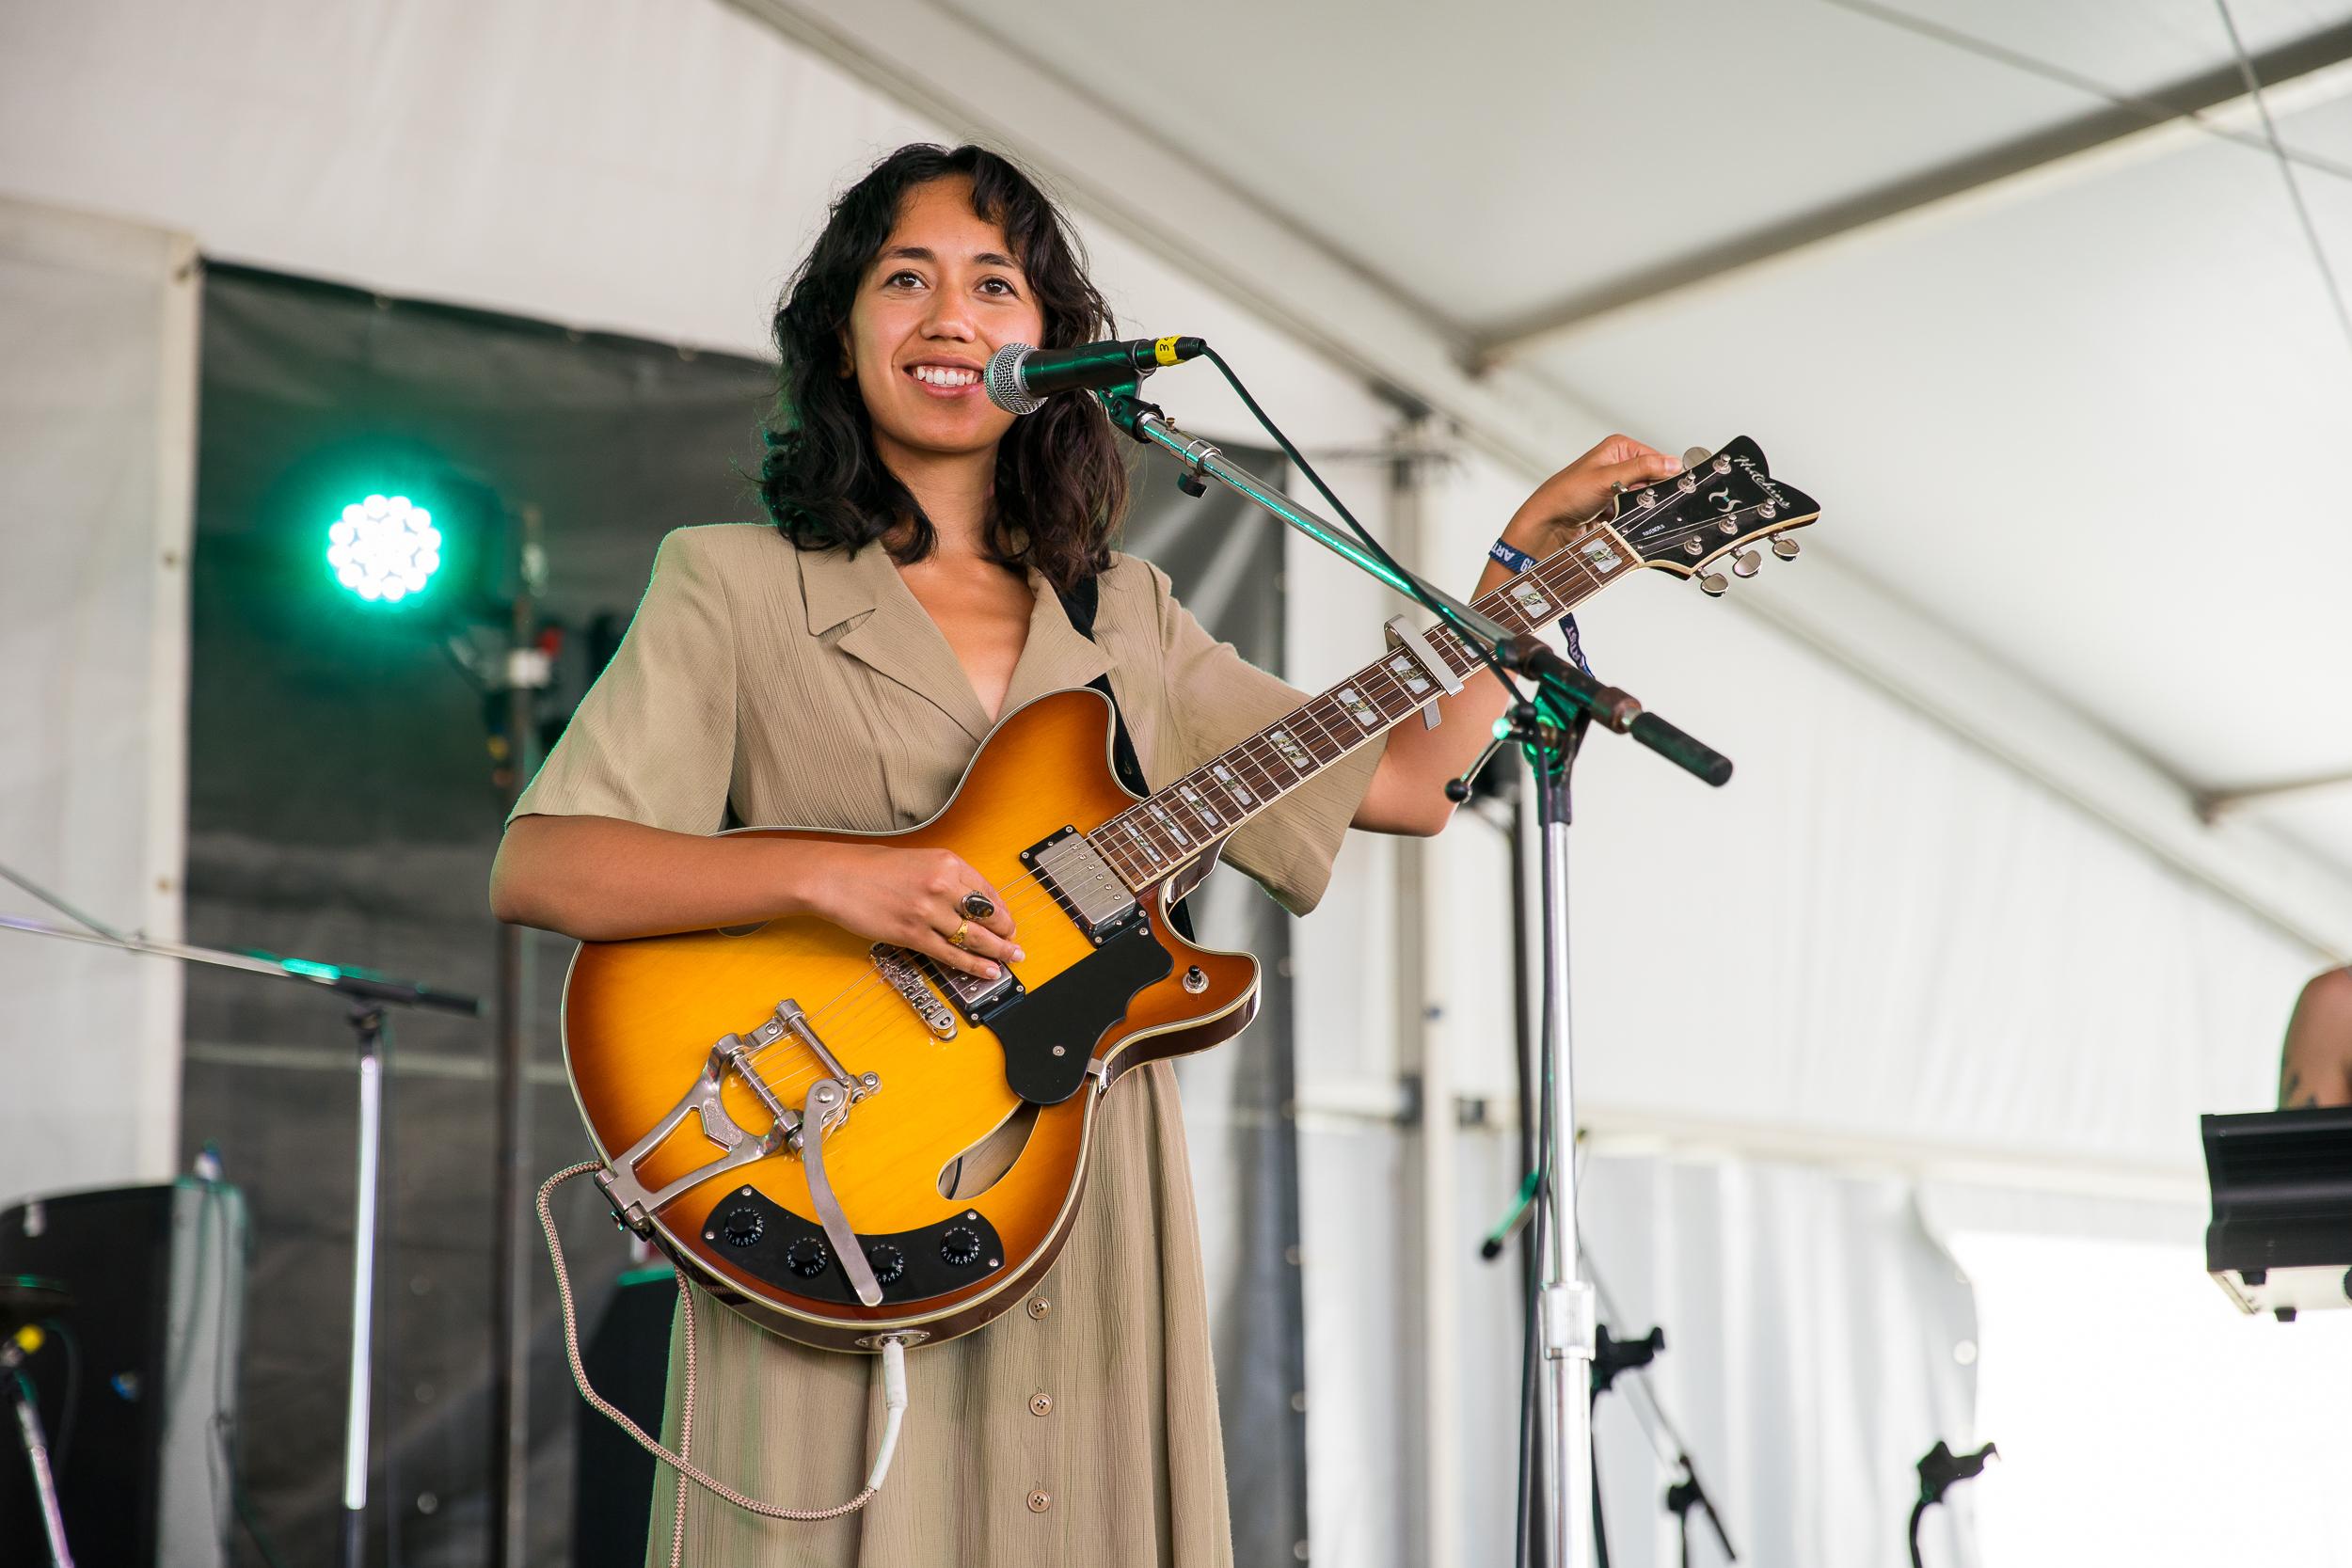 Haley Hendrickx at Newport Folk Festival (Photo by Mauricio Castro)